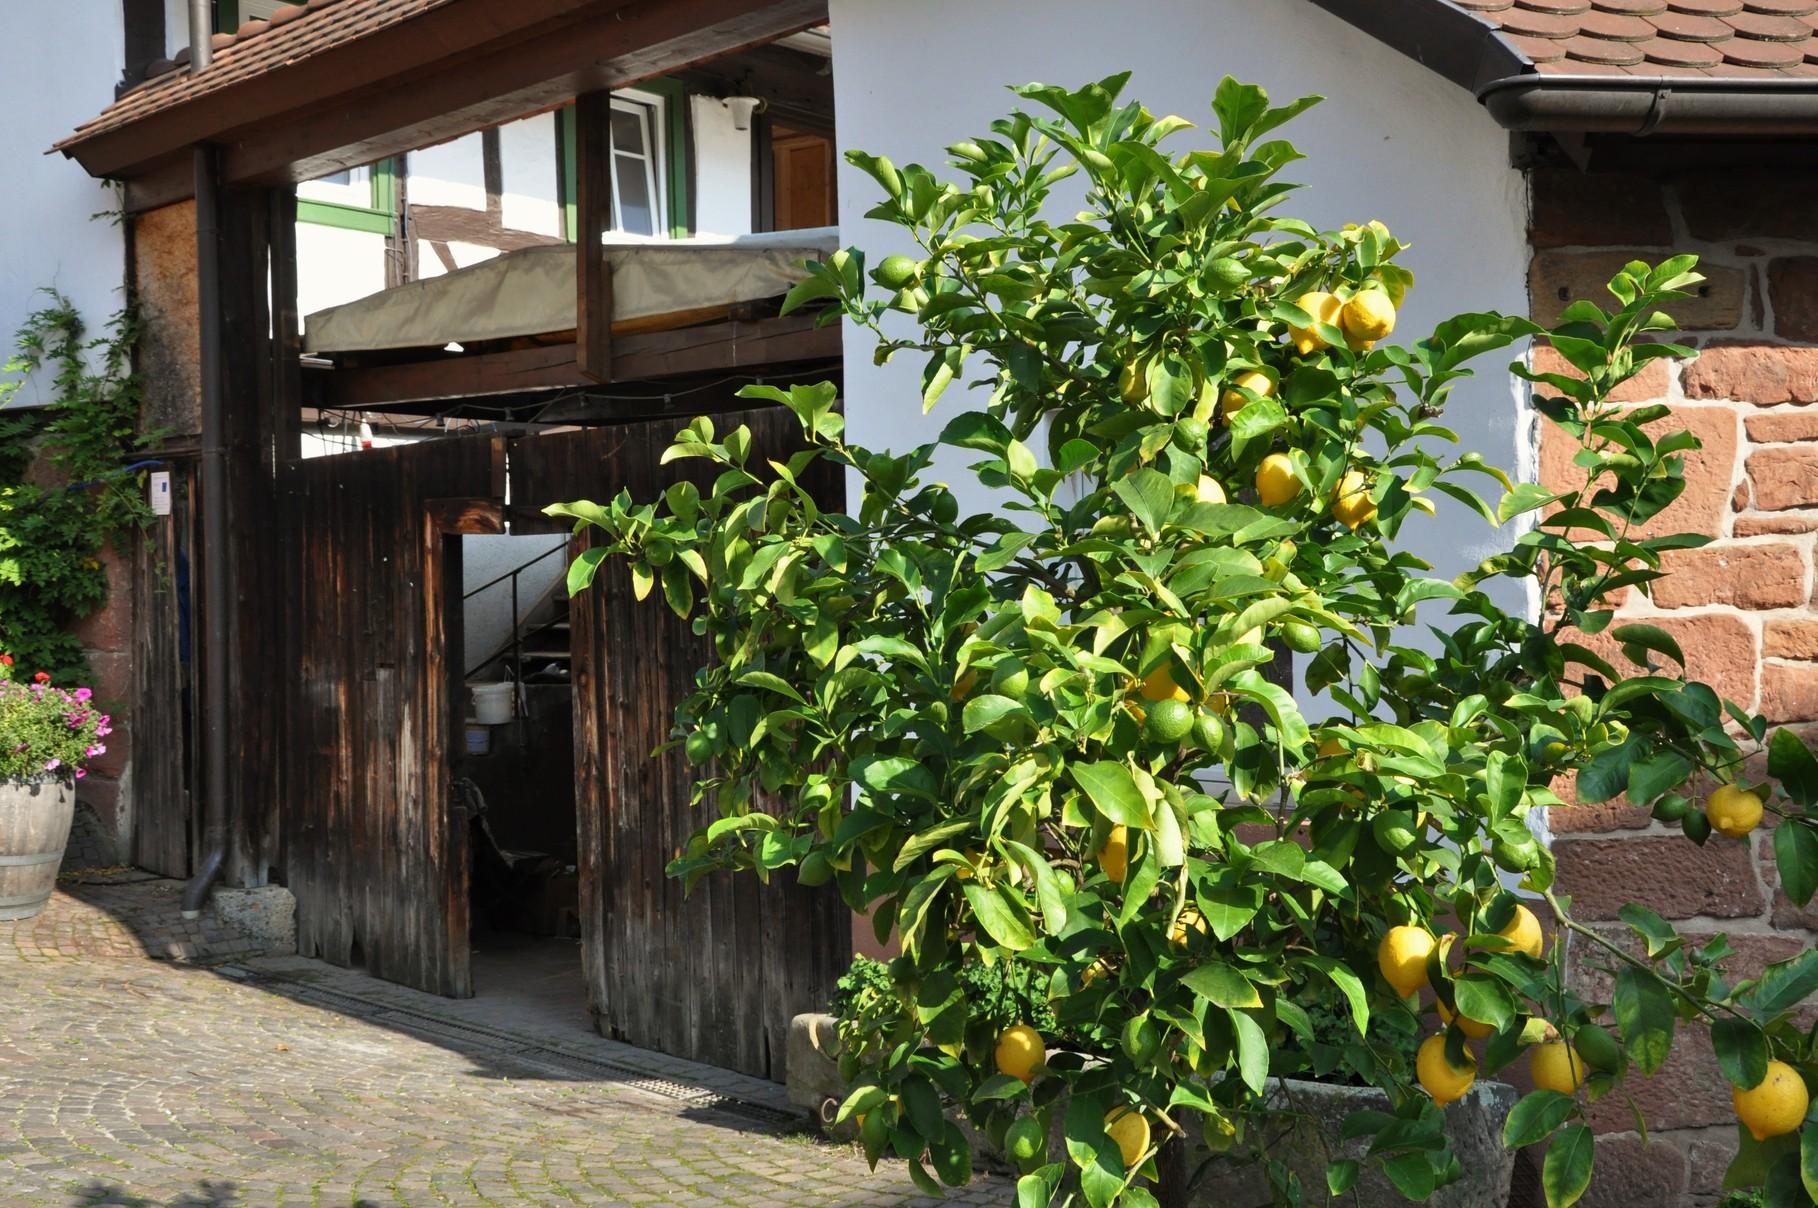 hier gibts auch Zitronen !!!!!!!!